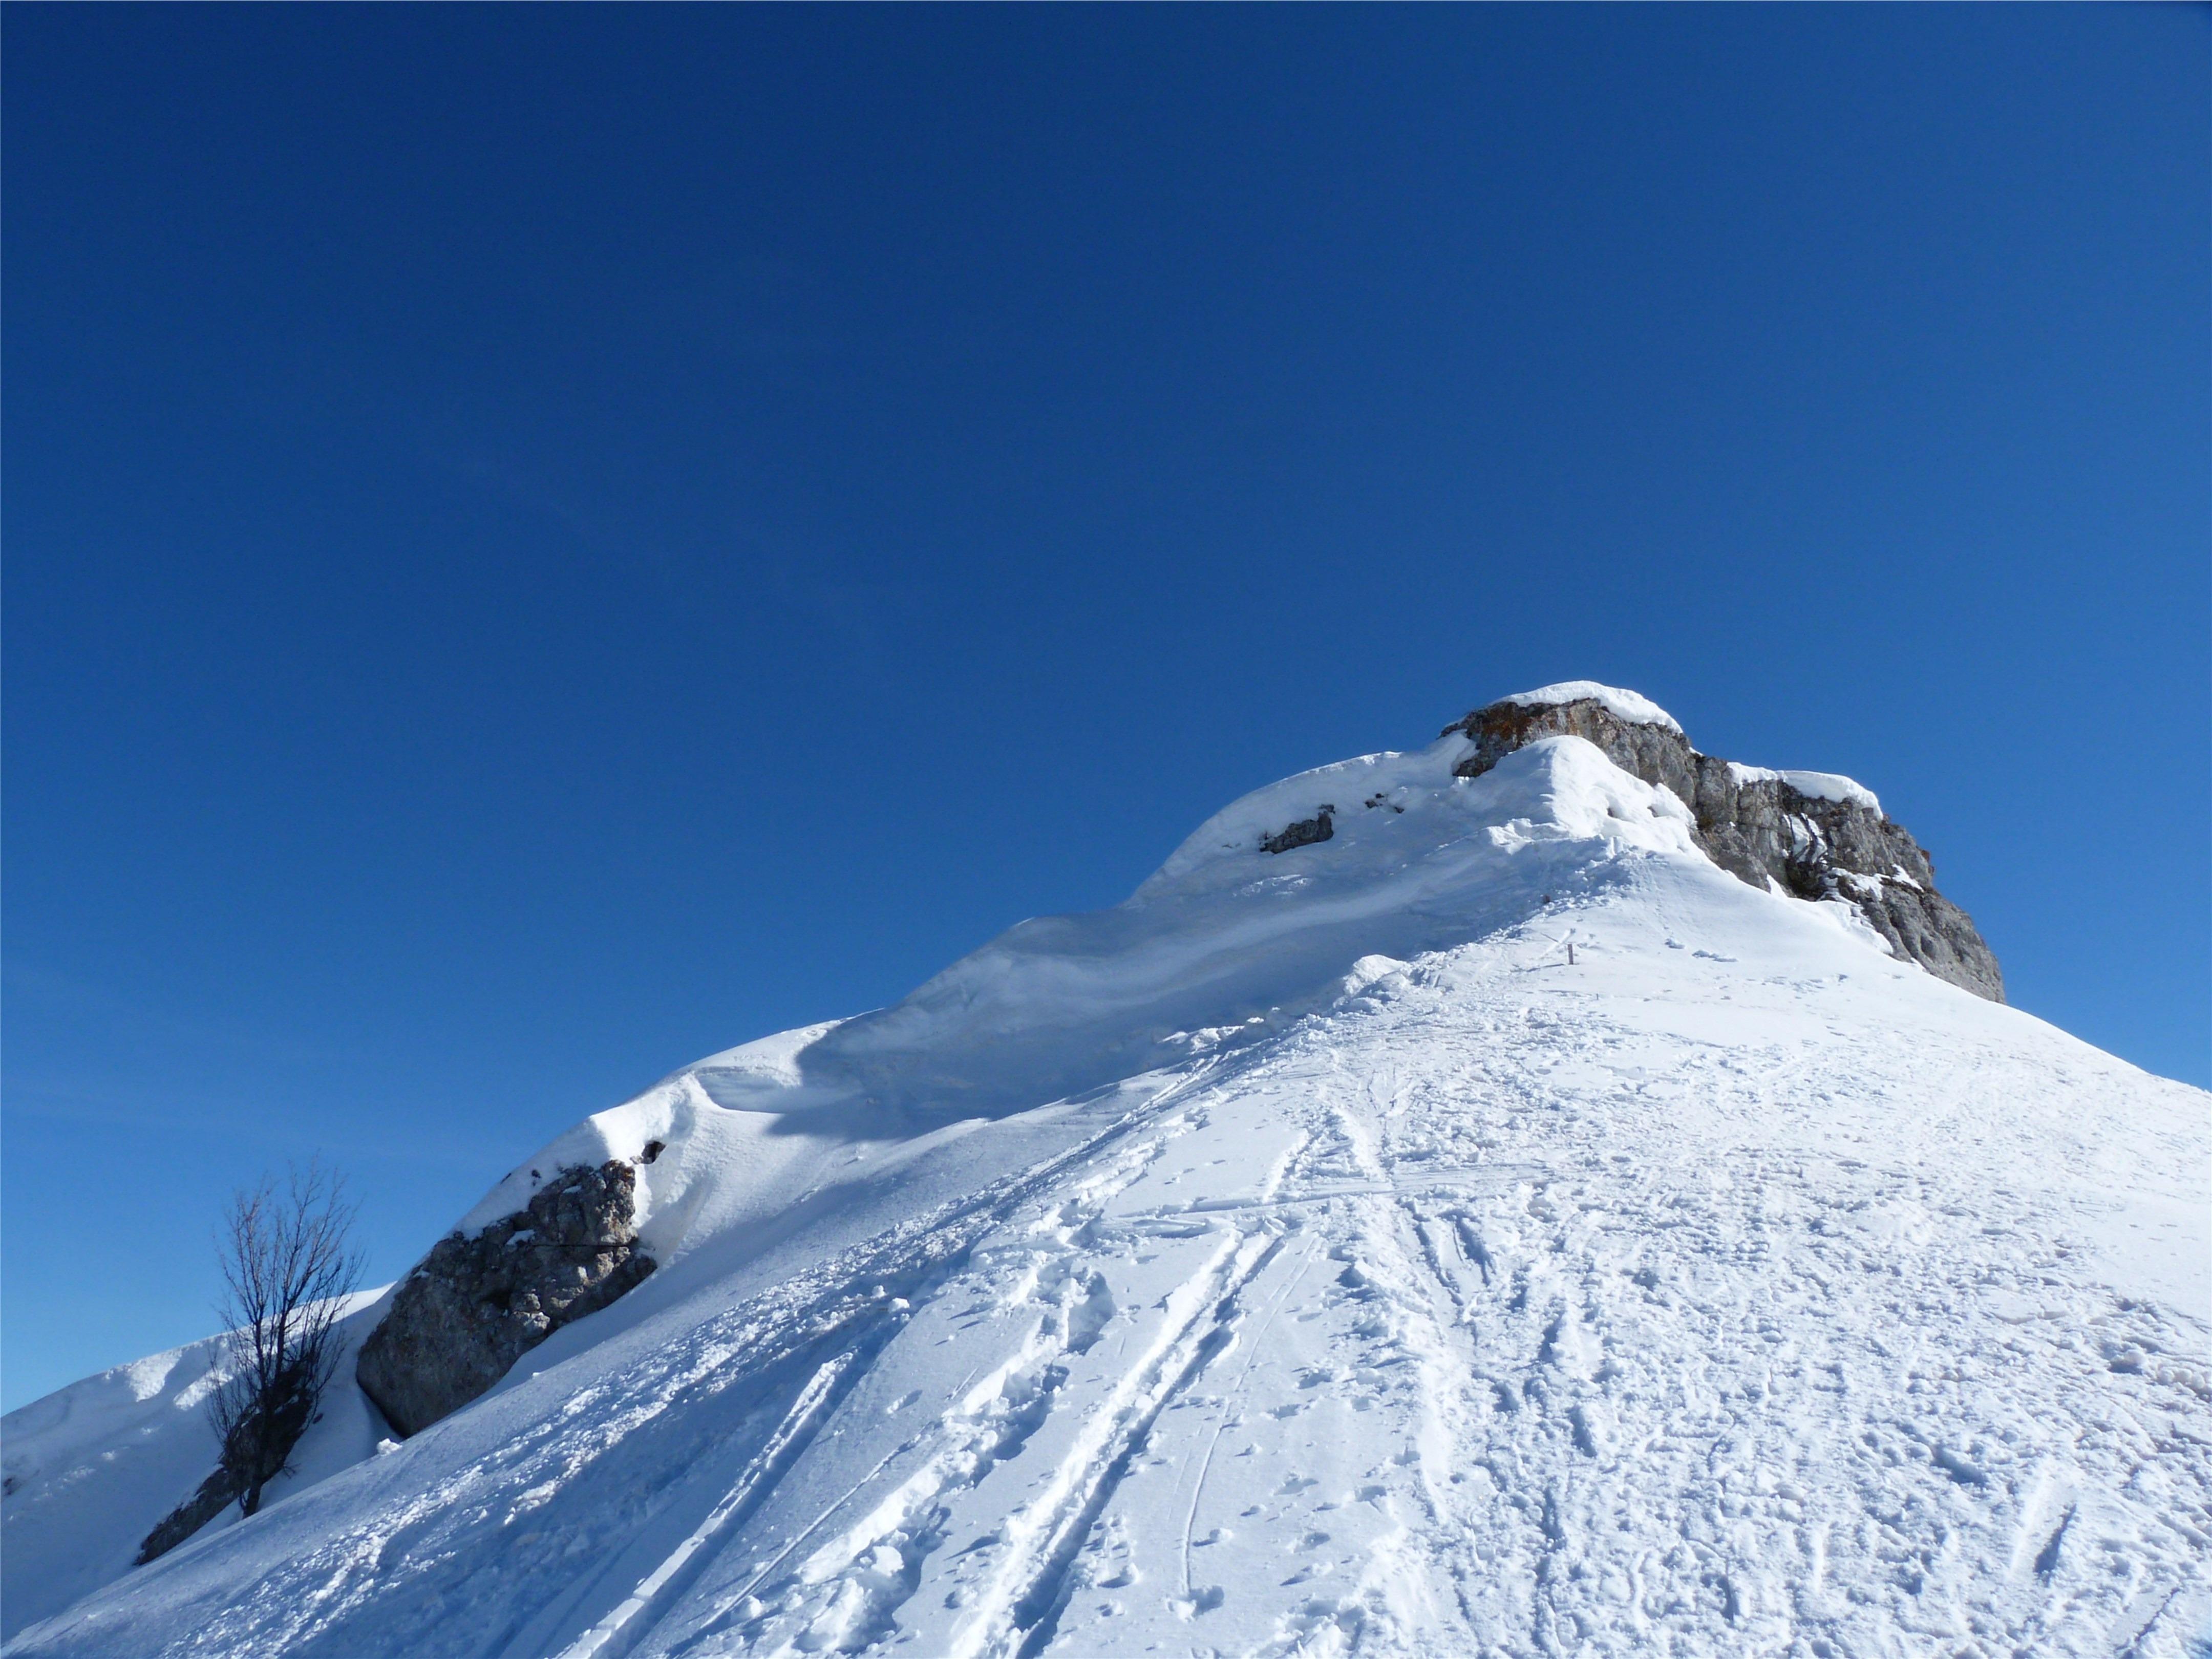 images gratuites paysage montagne neige hiver blanc cha ne de montagnes m t o ski. Black Bedroom Furniture Sets. Home Design Ideas